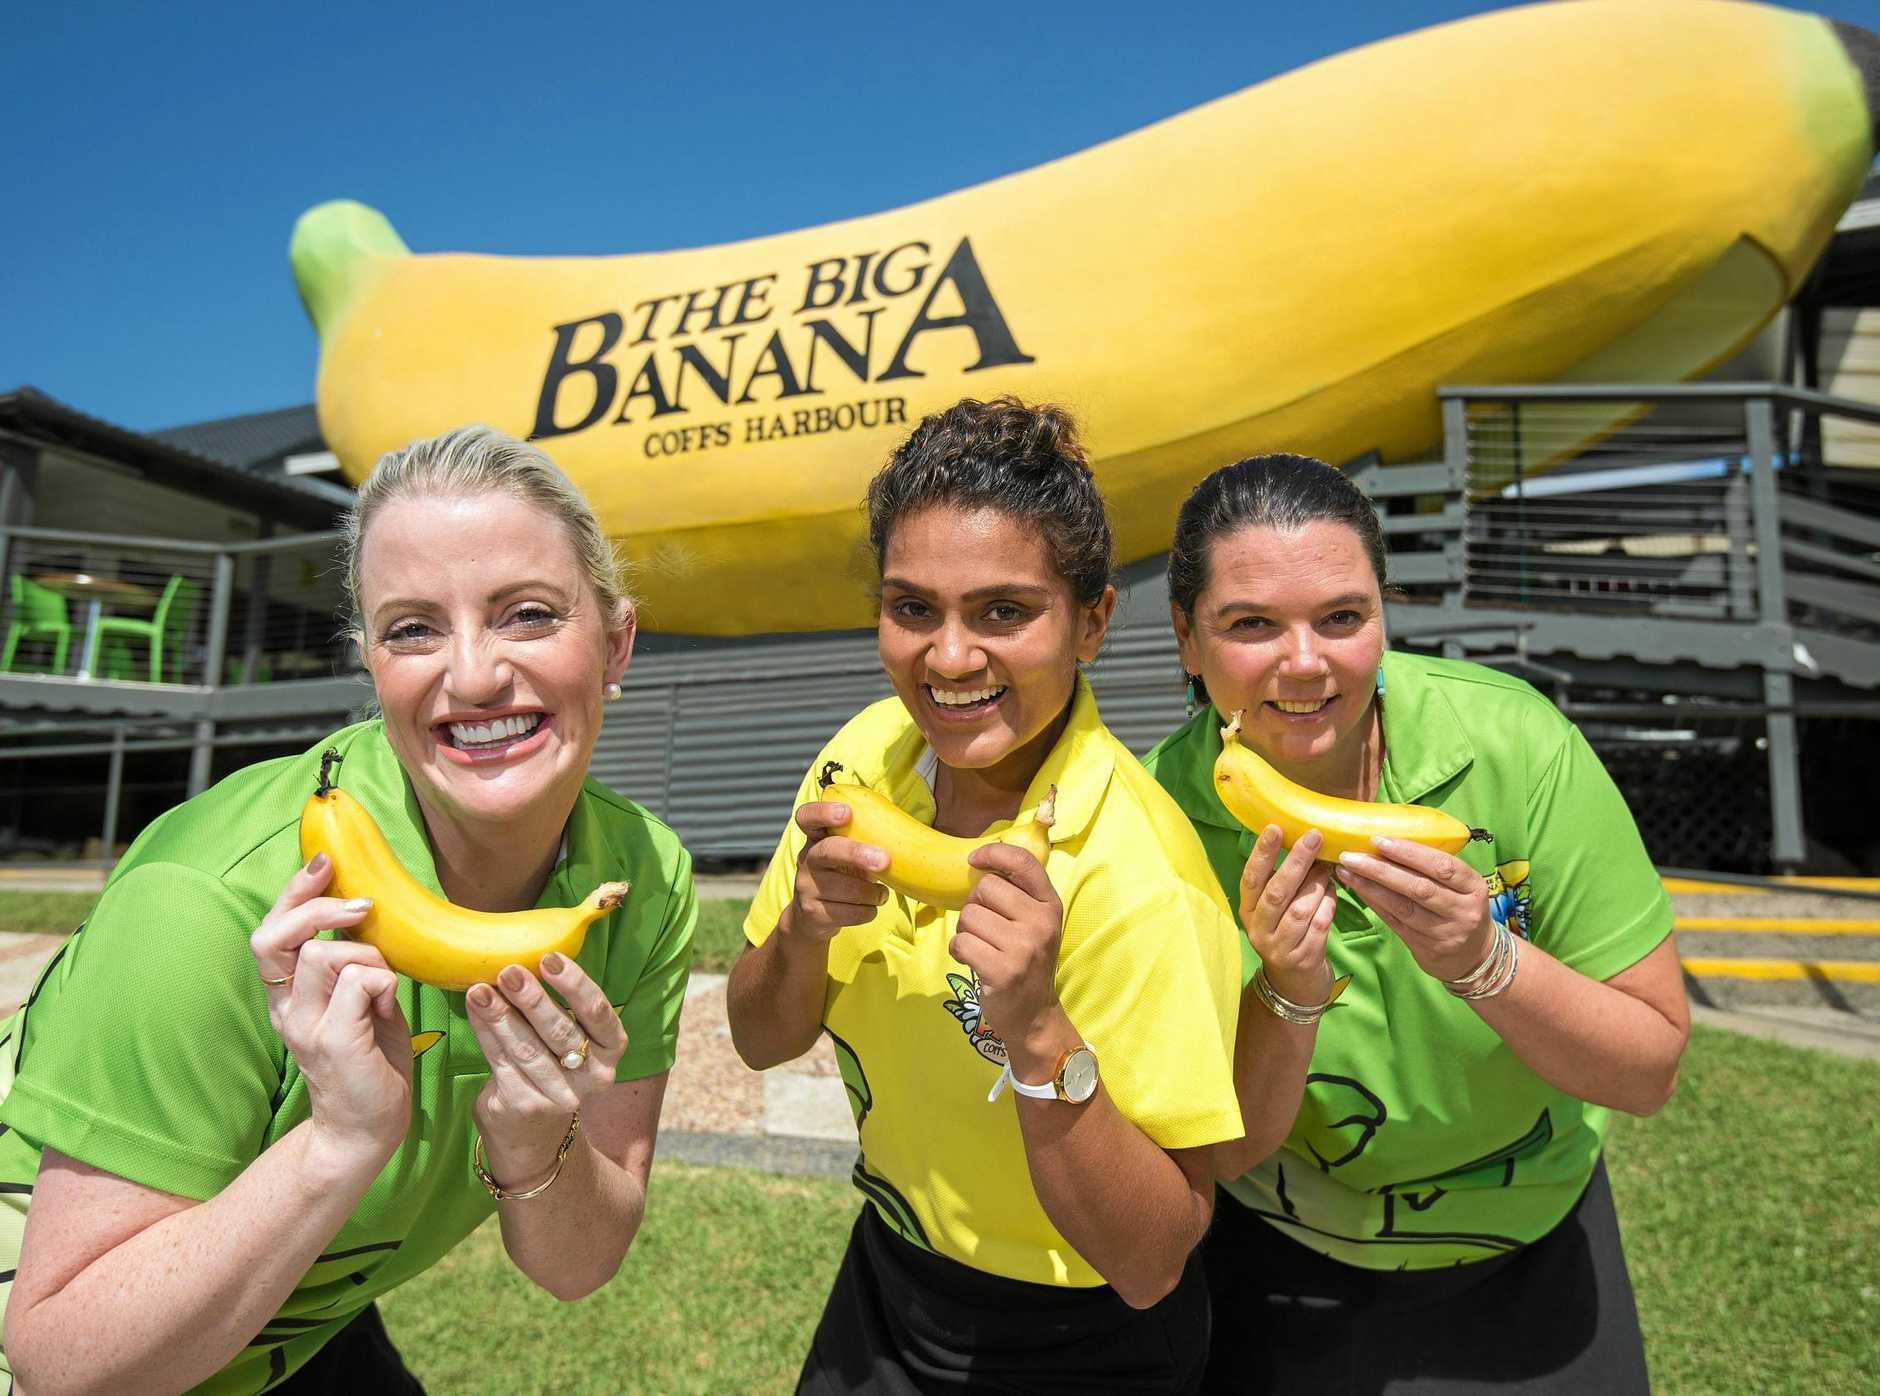 Big Banana staff members Elizabeth Courtenay, Raj Garcia and Angel Bell get into the spirit of National Banana Day.